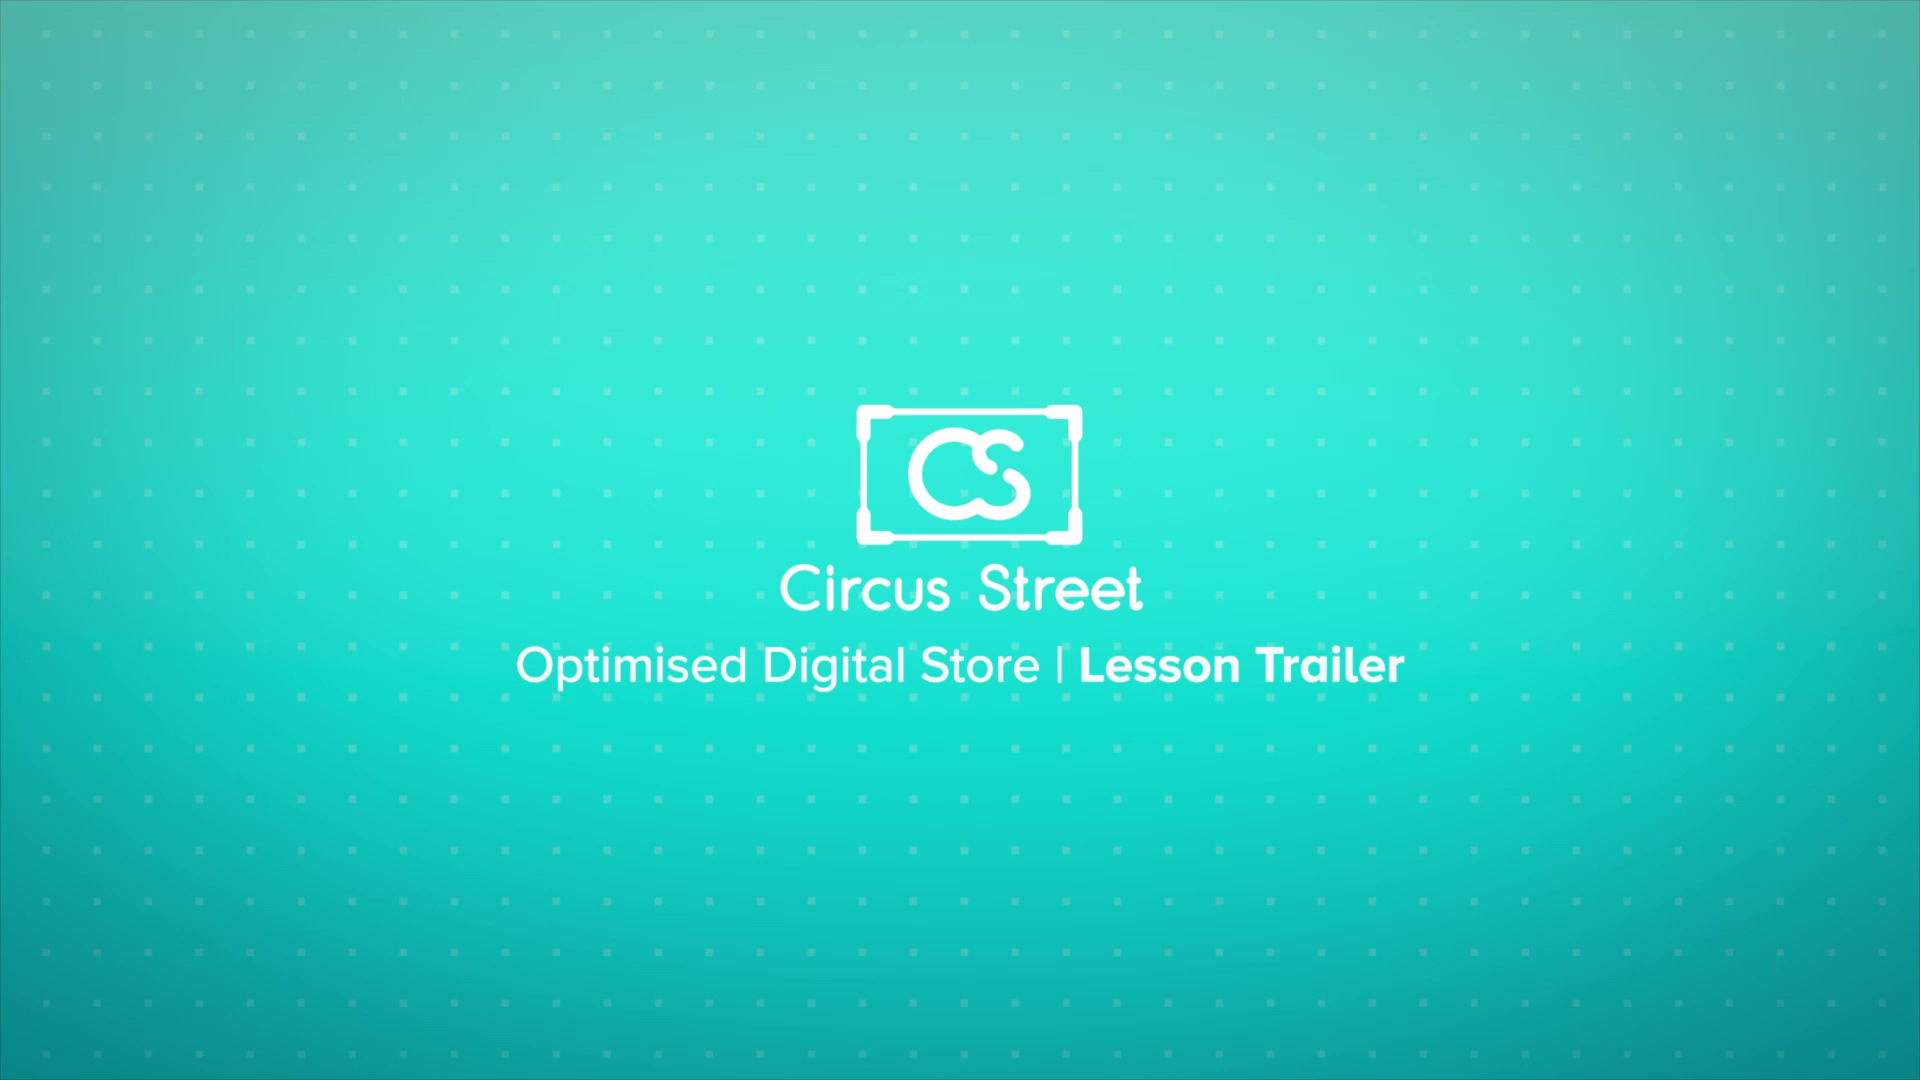 Optimised Digital Store Trailer